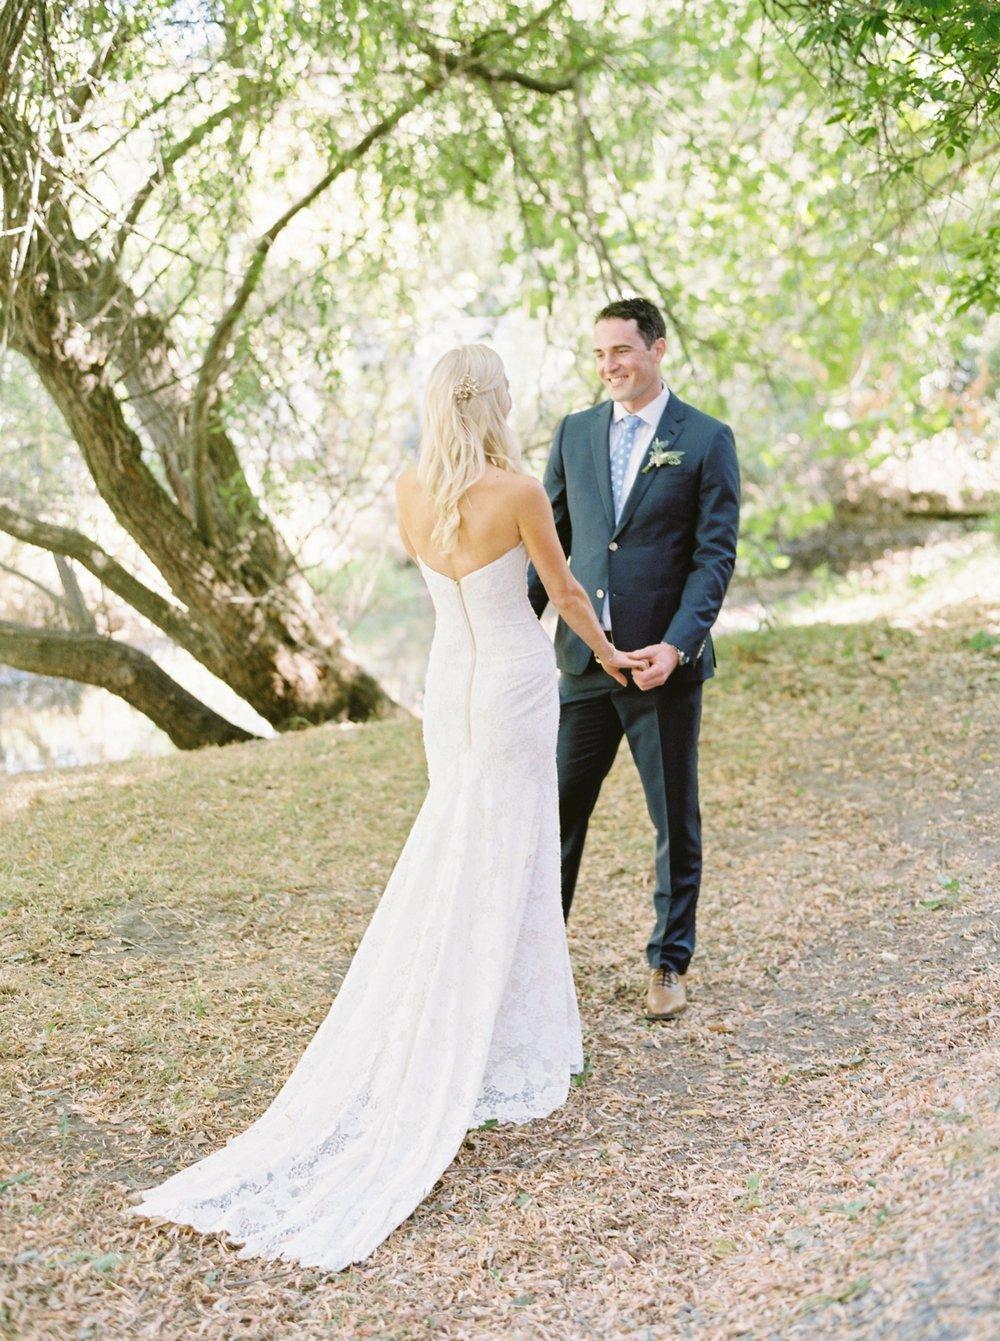 Kelowna wedding photographers | hotel eldorado wedding photographer | justine milton fine art film photography | bride and groom | bride and groom portraits | holding hands